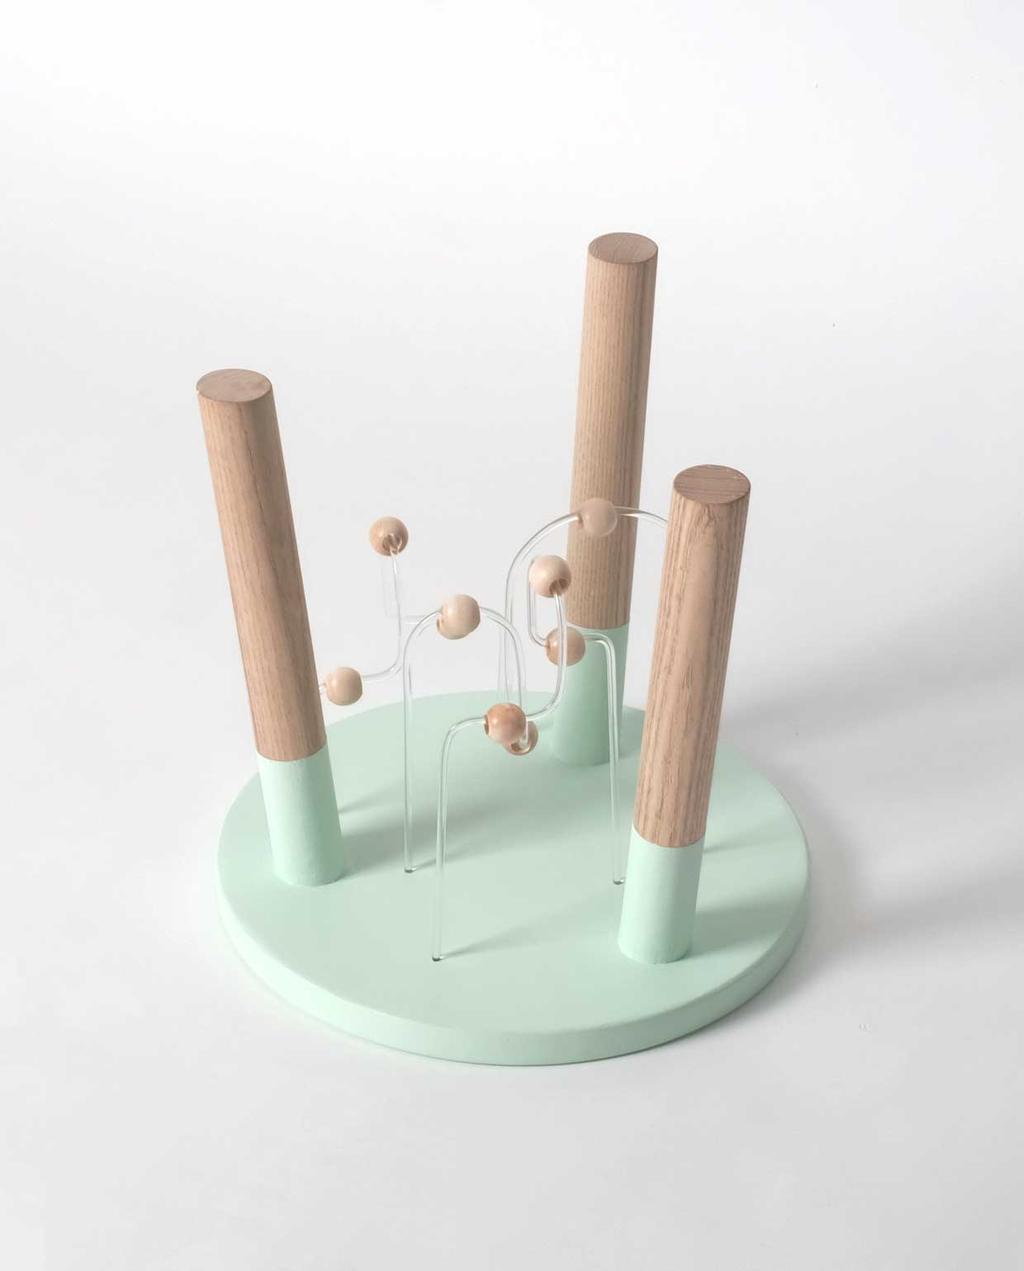 vtwonen | studentdesign | design speelgoed | hyeona kim | wooseok lee